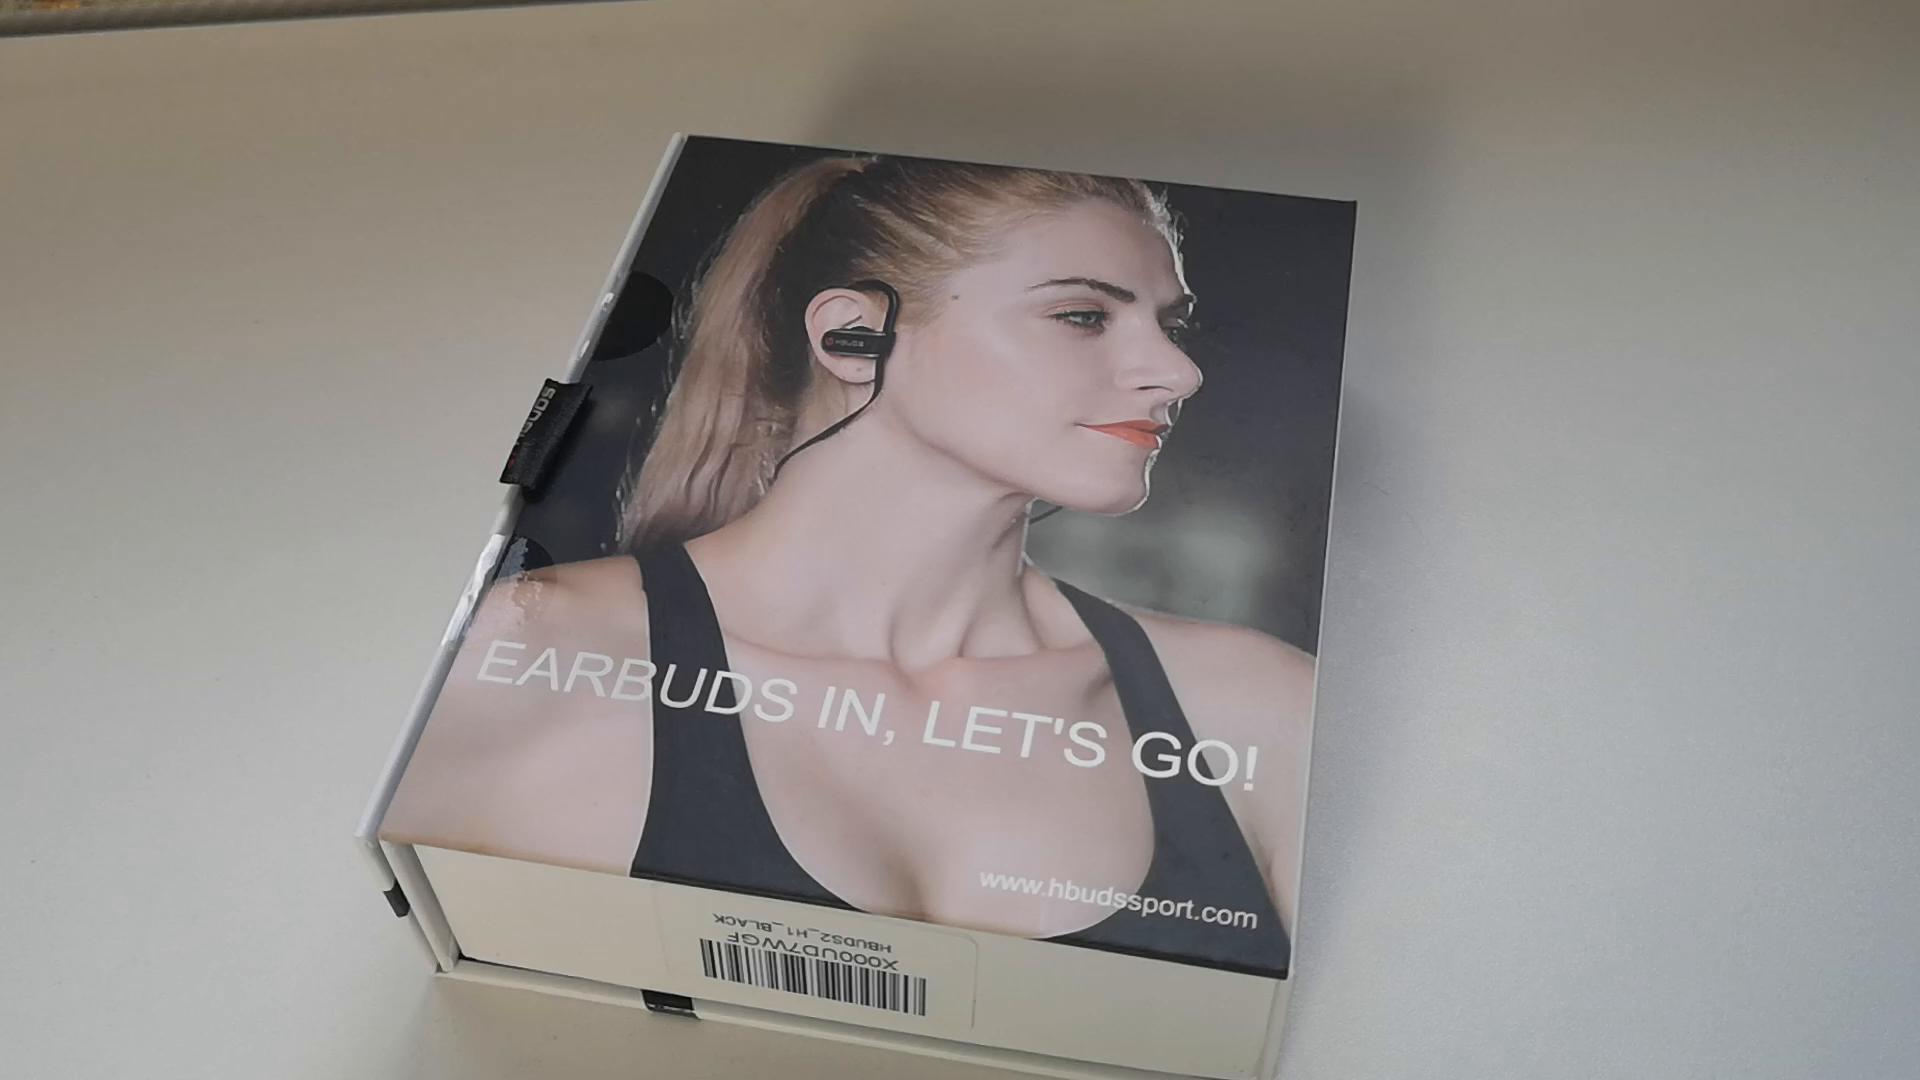 Auriculares Bluetooth 4.1 HBUDS Auriculares Deportivos Inalámbricos Estéreo In-Ear Auriculares con Micrófono 8-9 Hrs y Cancelación de Ruido para iPhone XS ...